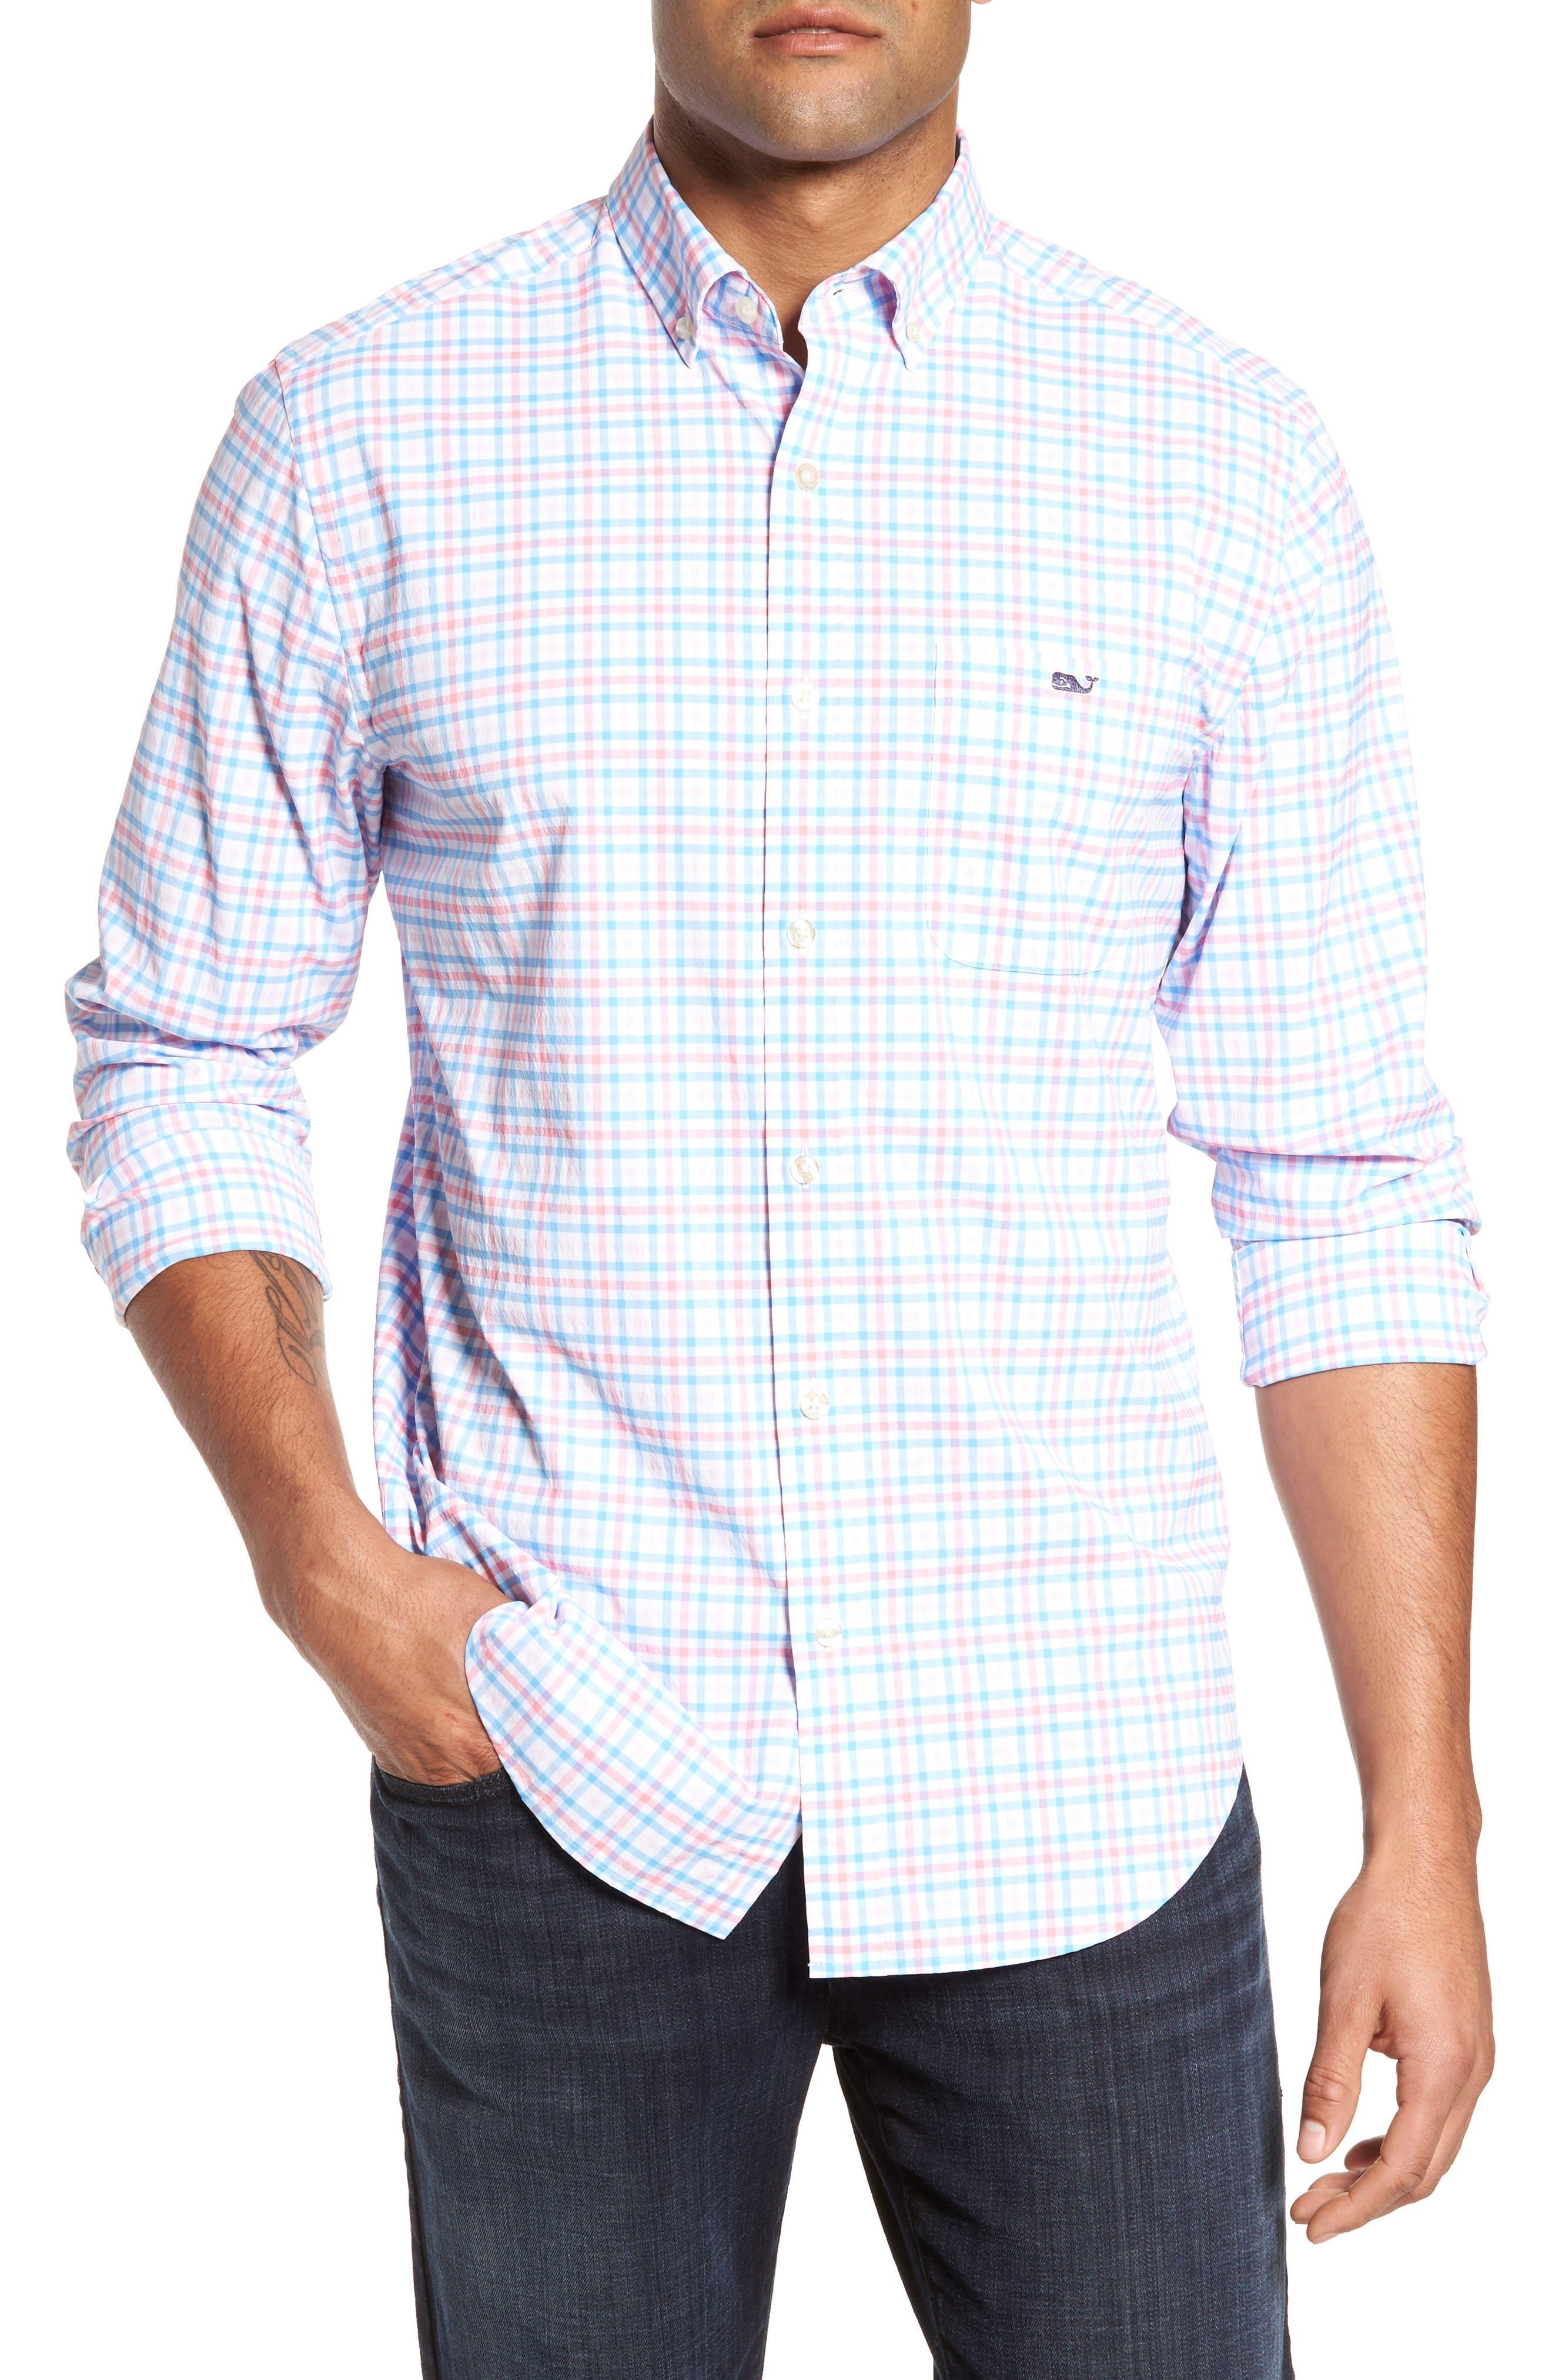 Gulf Shore Tucker Classic Fit Gingham Sport Shirt,                             Main thumbnail 1, color,                             956